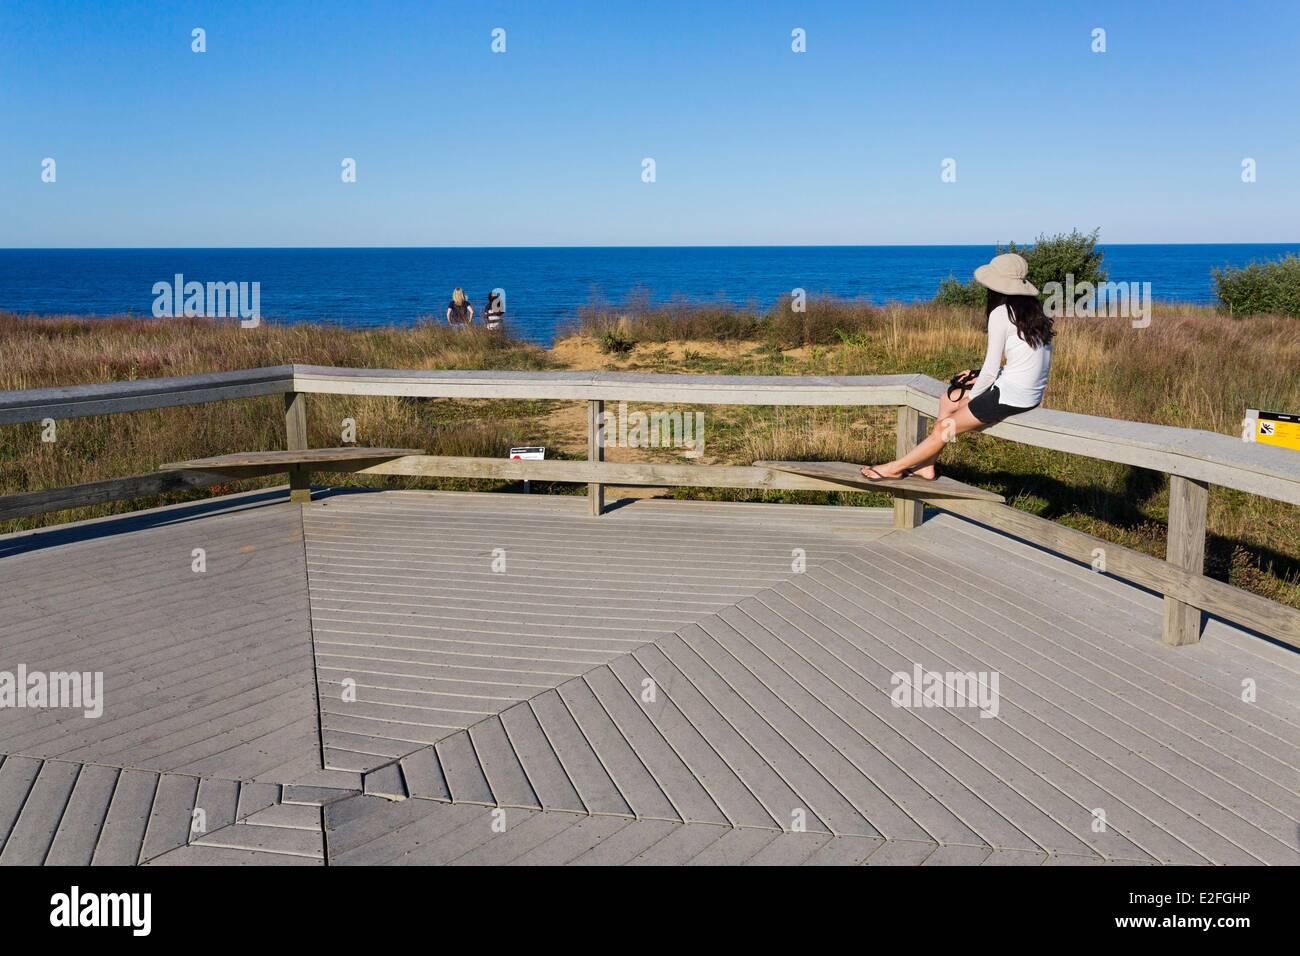 United States, Massachusetts, Cape Cod, Truro, Highland Lighthouse, the beach - Stock Image